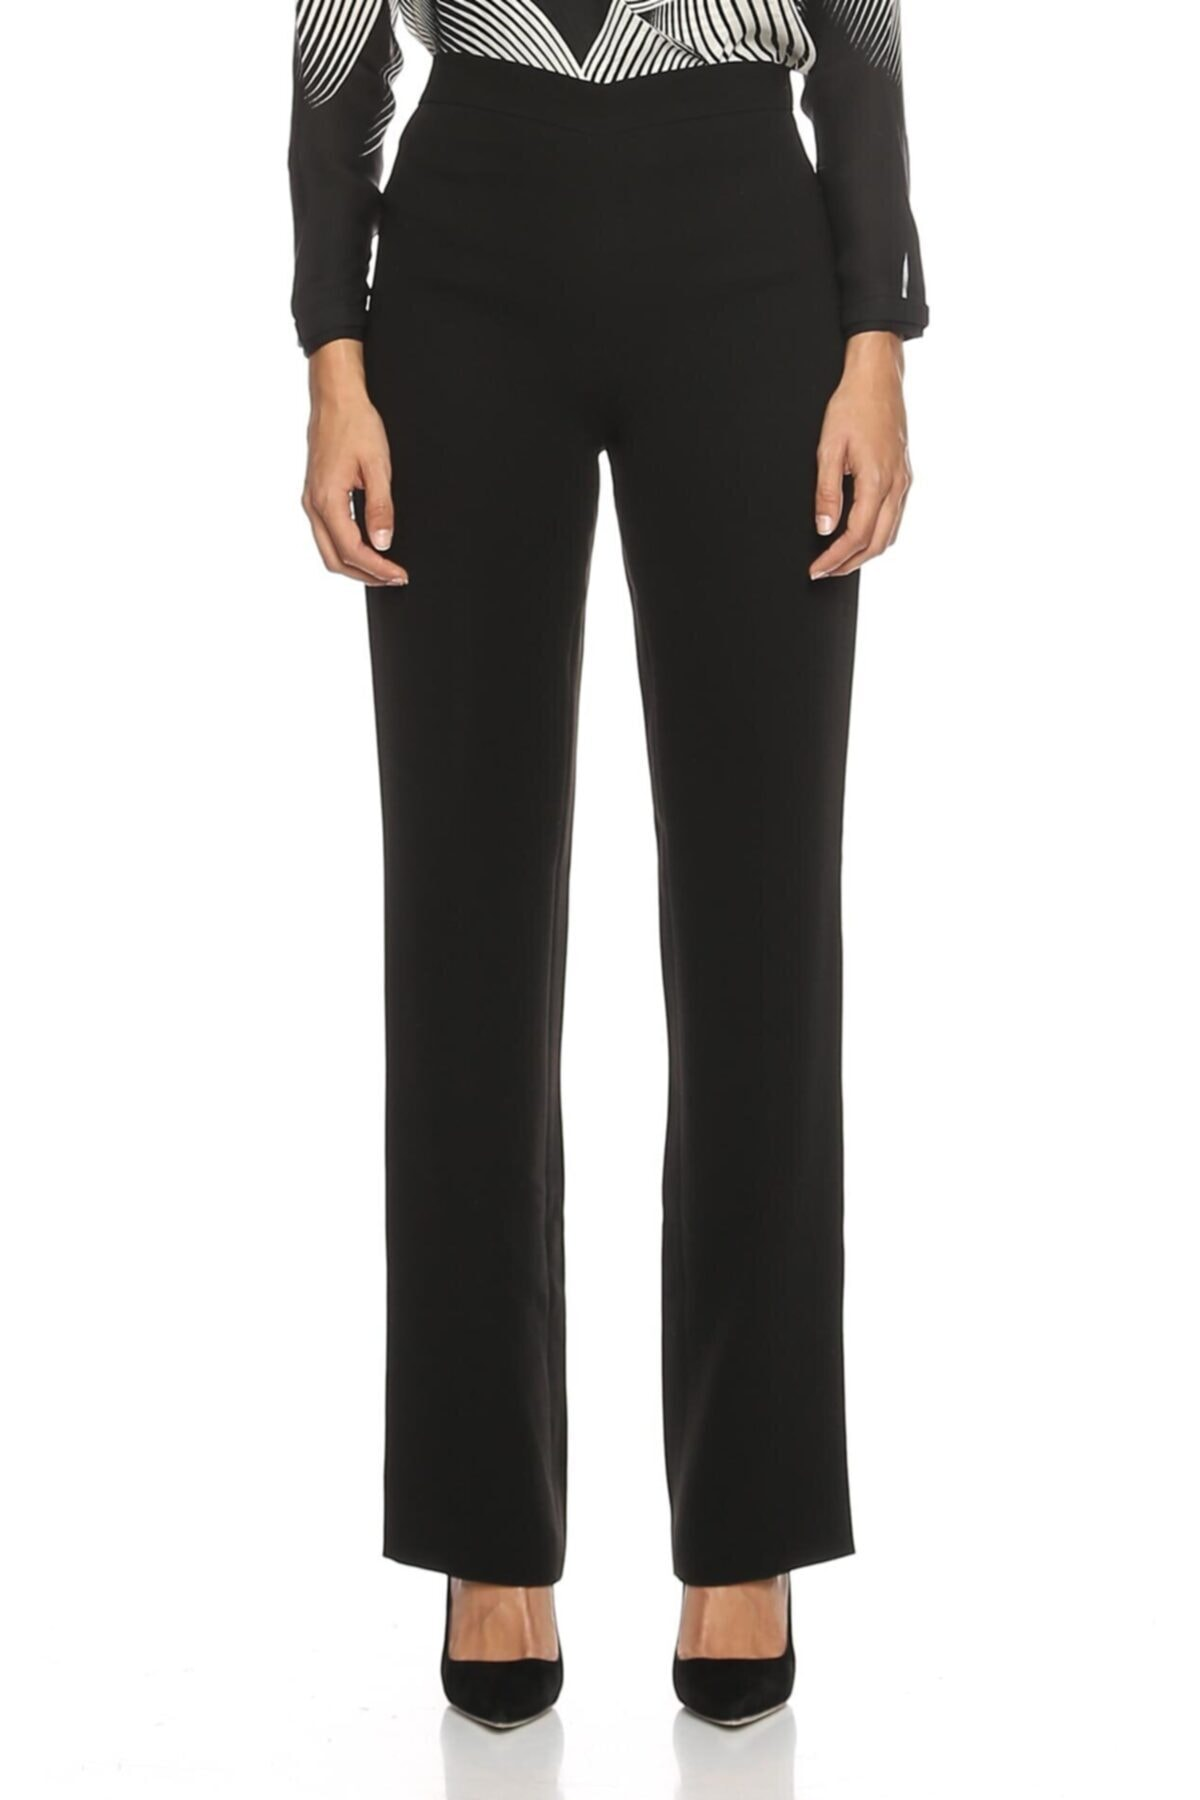 Jean Paul Gaultier Klasik Pantolon 1